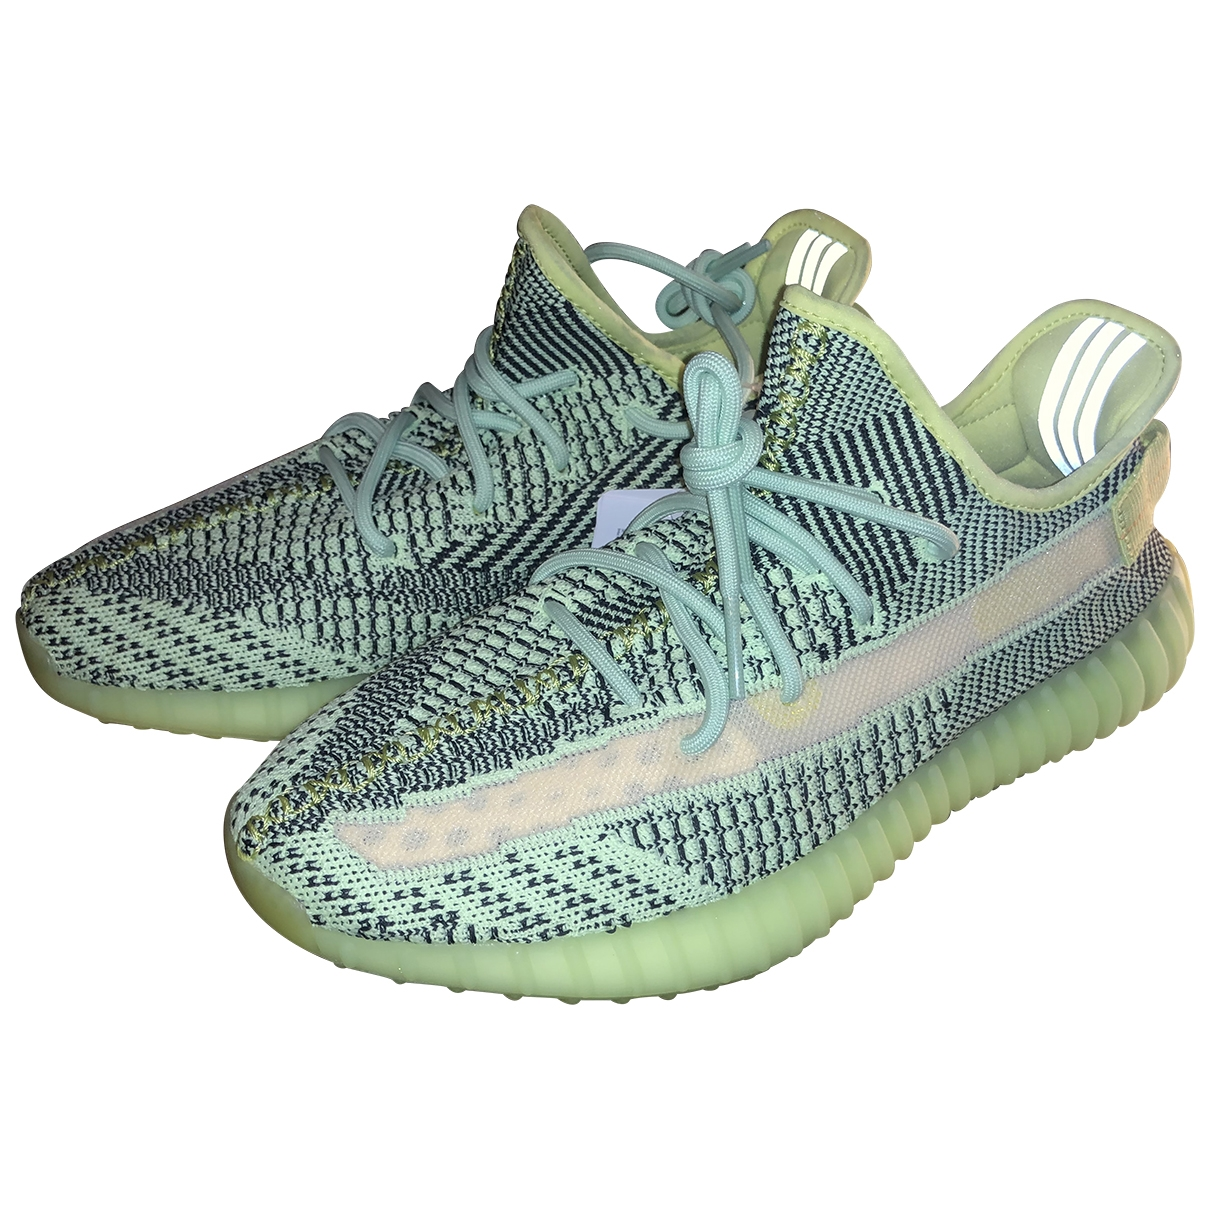 Yeezy X Adidas - Baskets Boost 350 V2 pour homme en toile - jaune